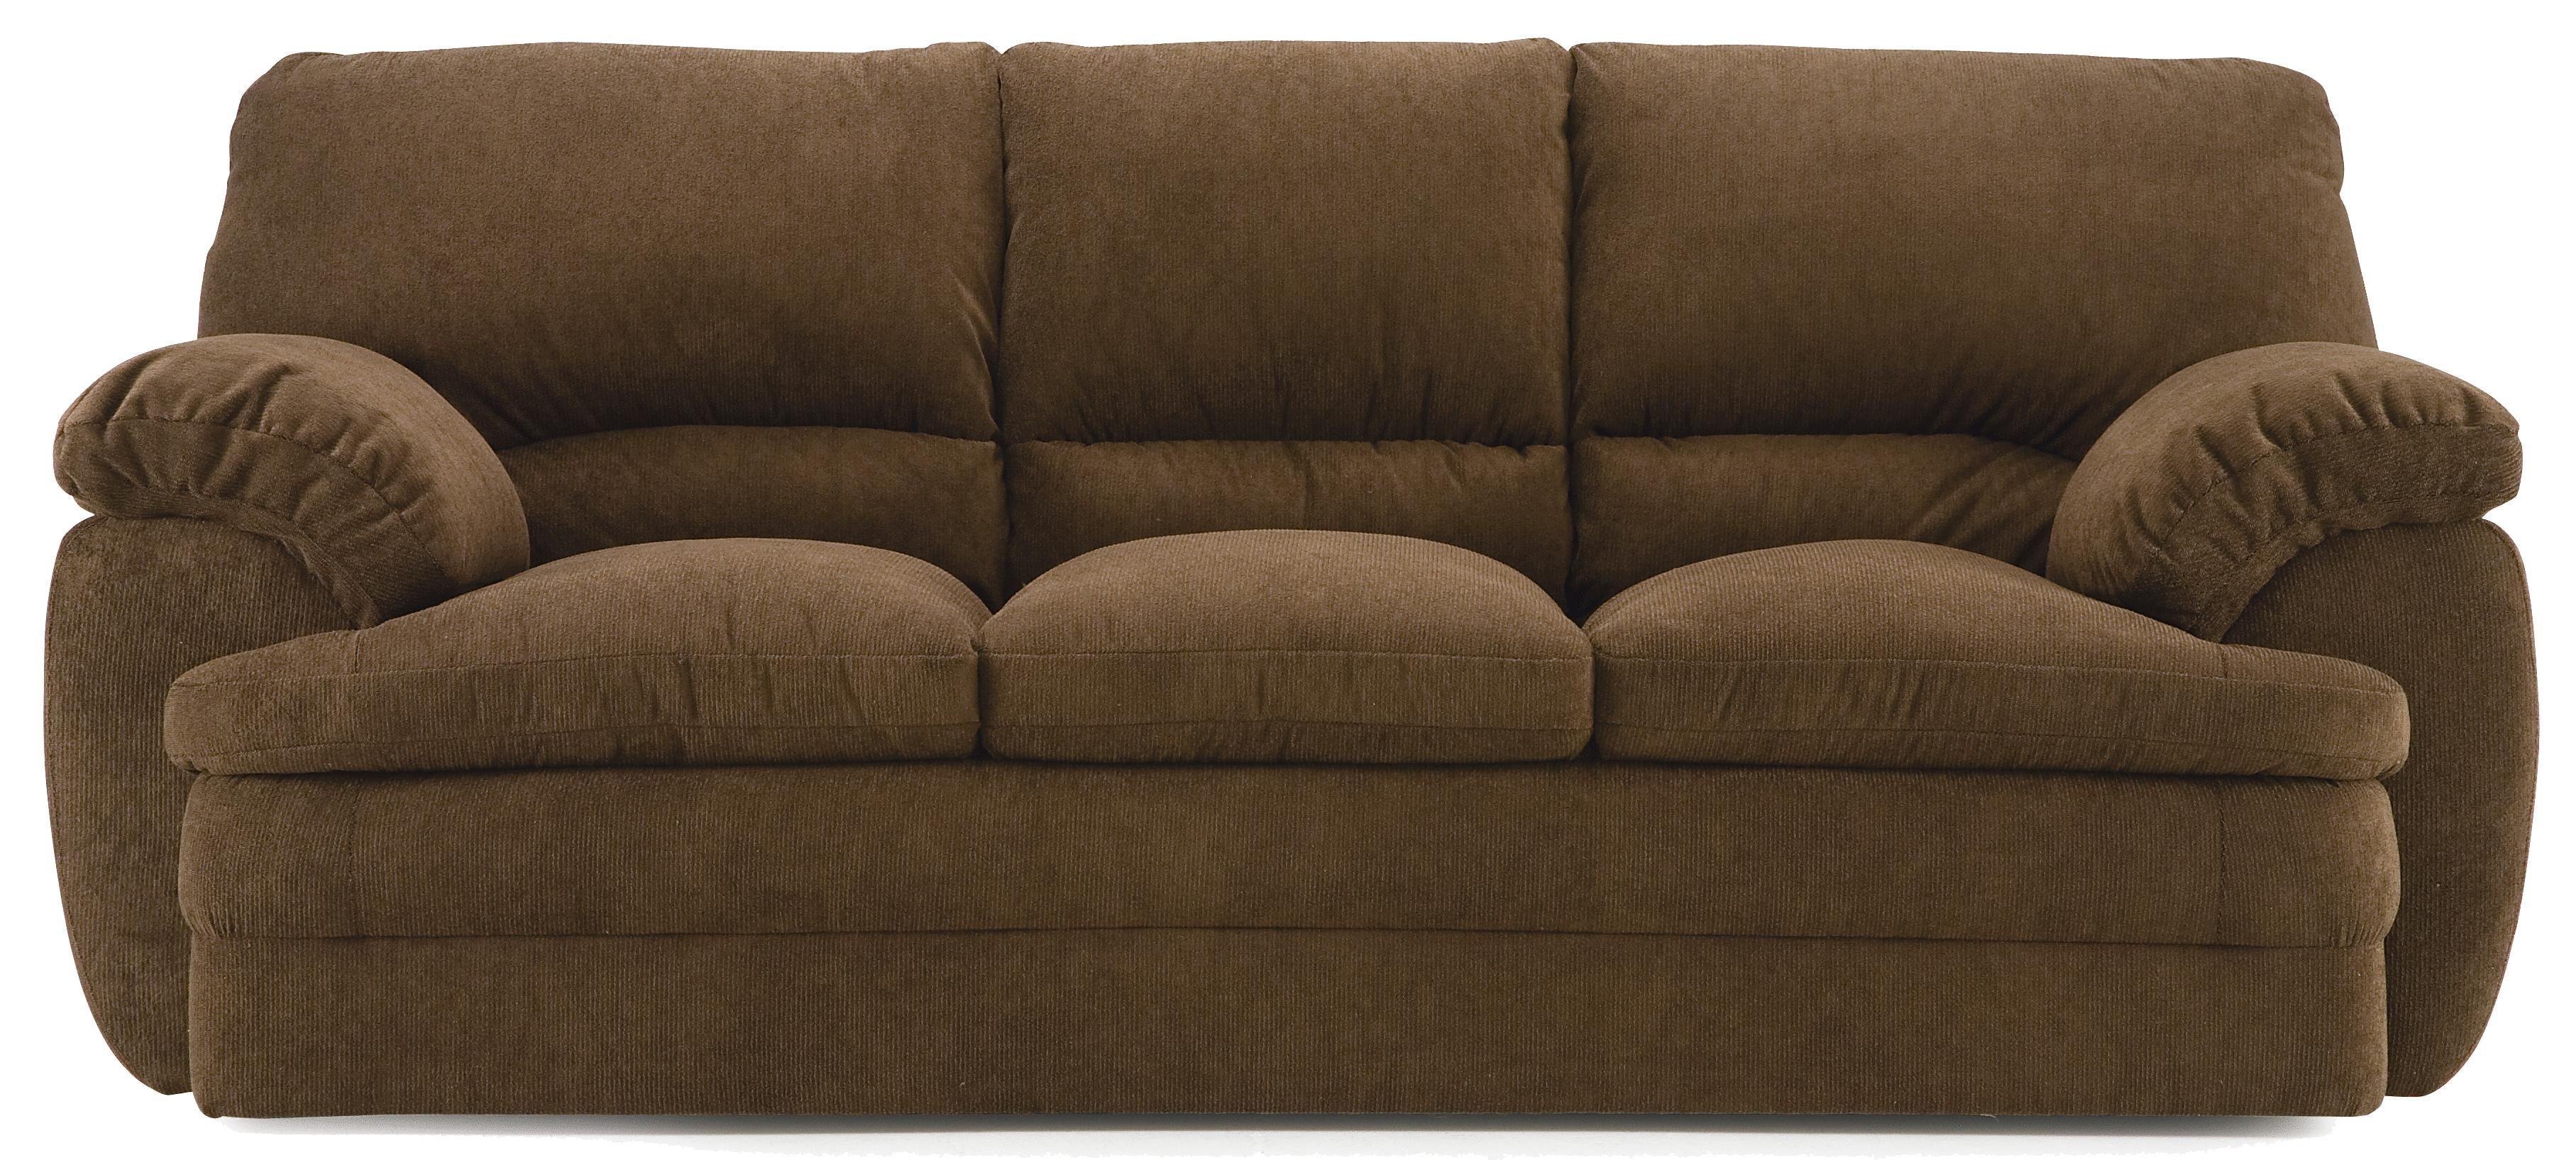 Palliser Marcella Pillow Top Sofa